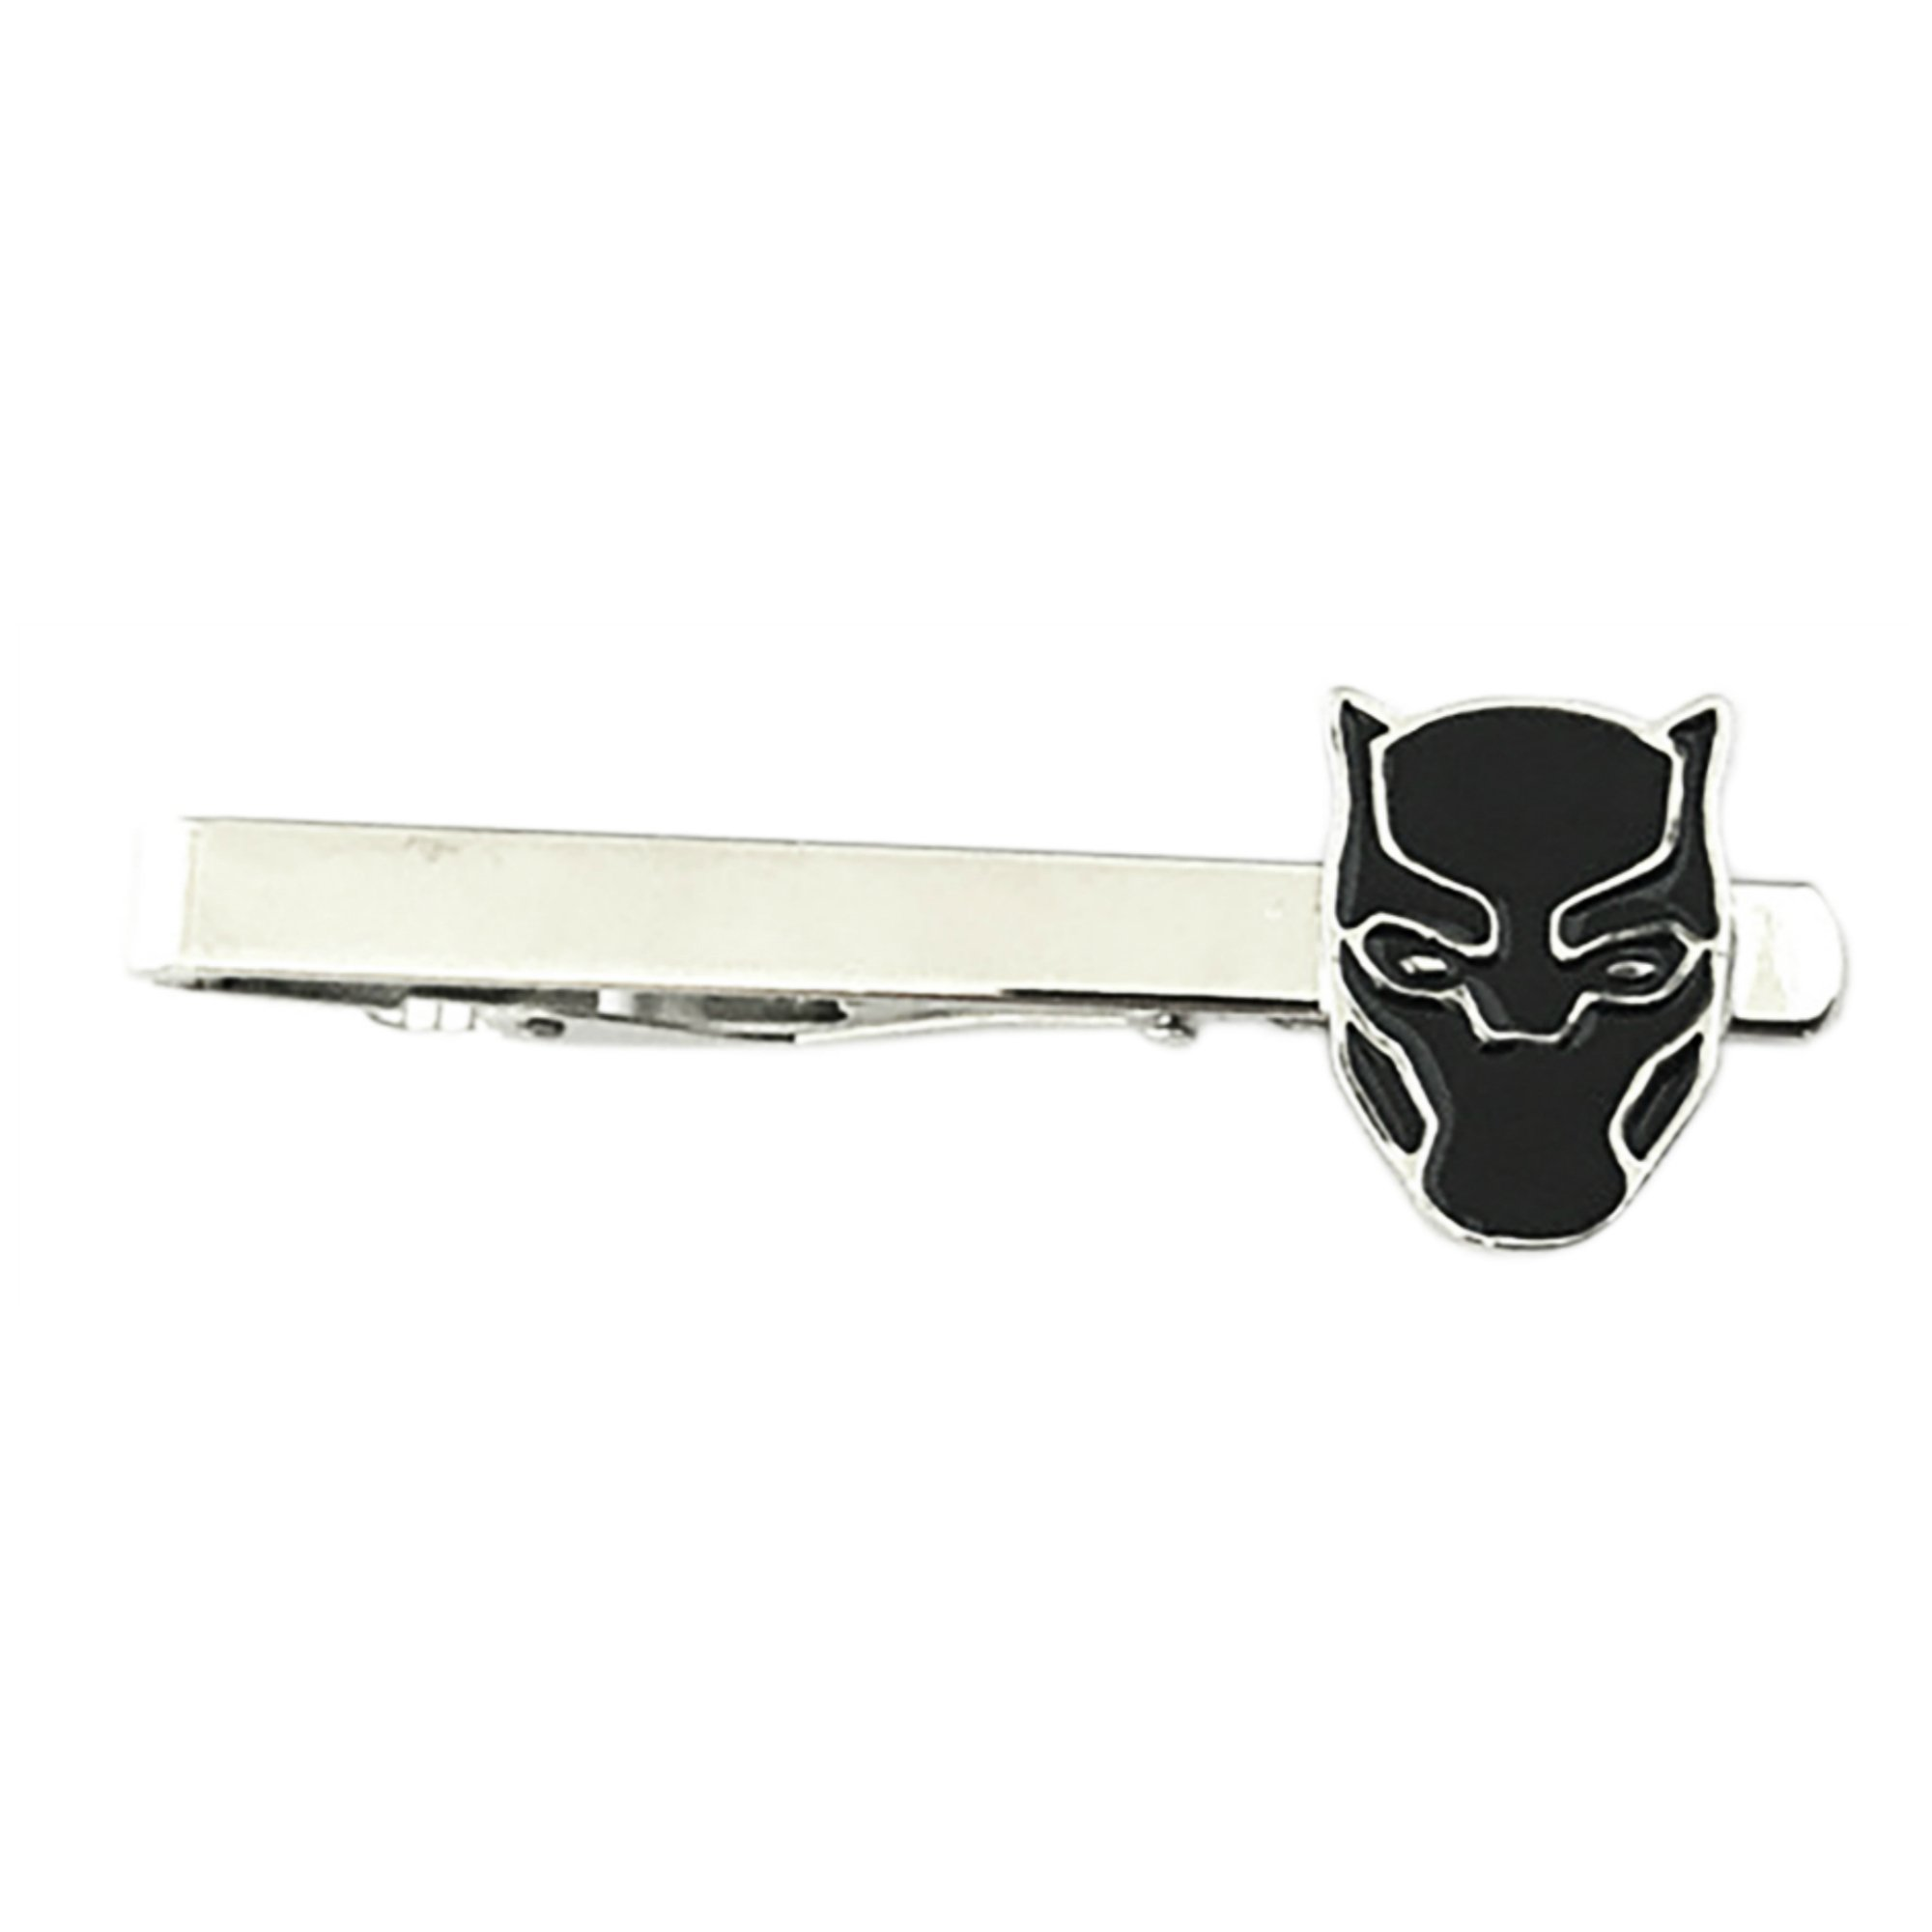 Outlander Marvel Comics - The Black Panther - Tiebar Tie Clasp Wedding Superhero Logo w/Gift Box